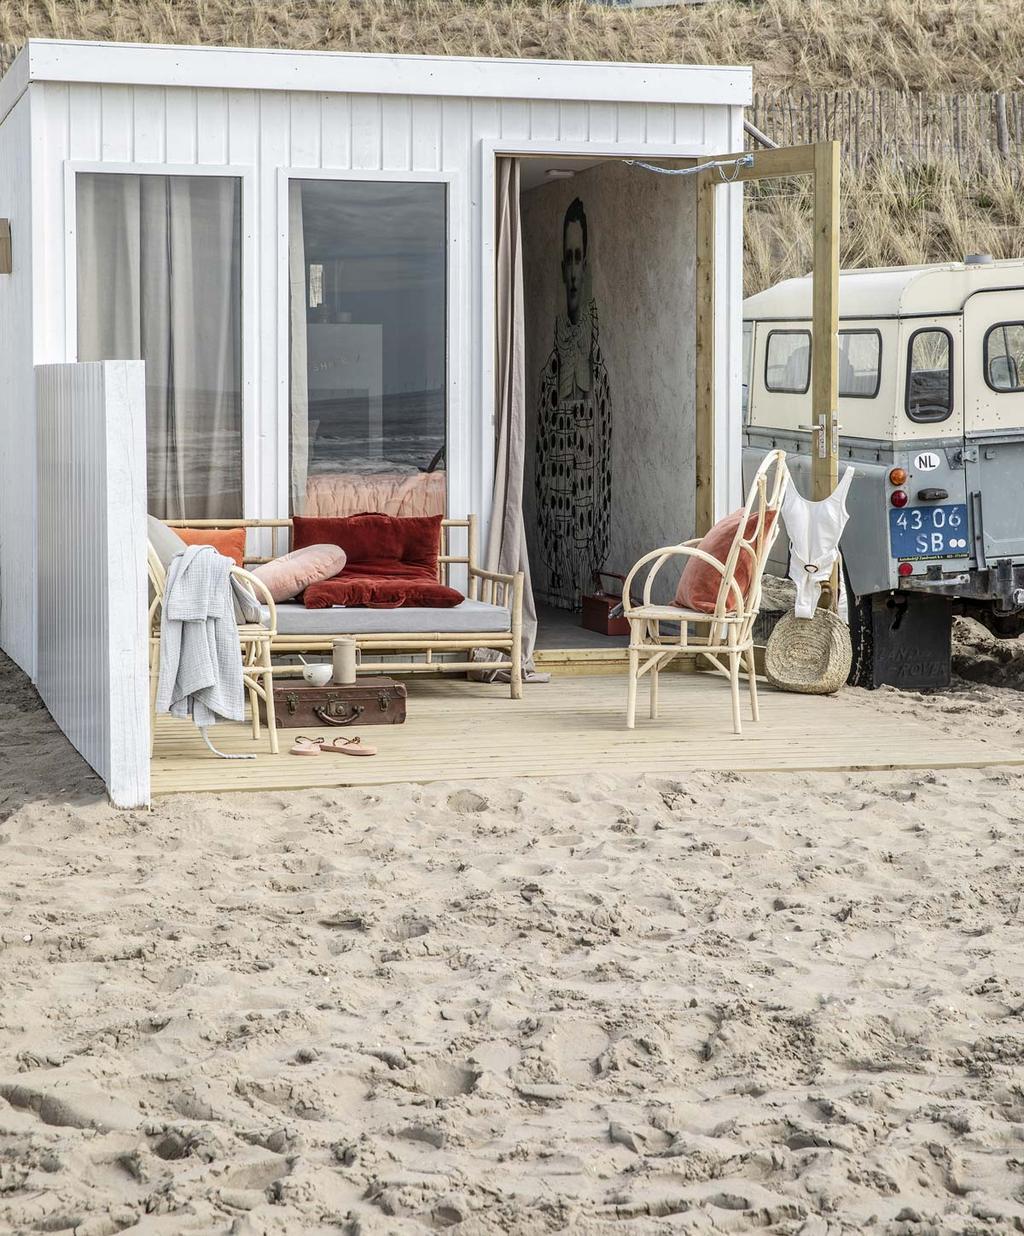 vtwonen strandkamers ajuma beach in Zandvoort